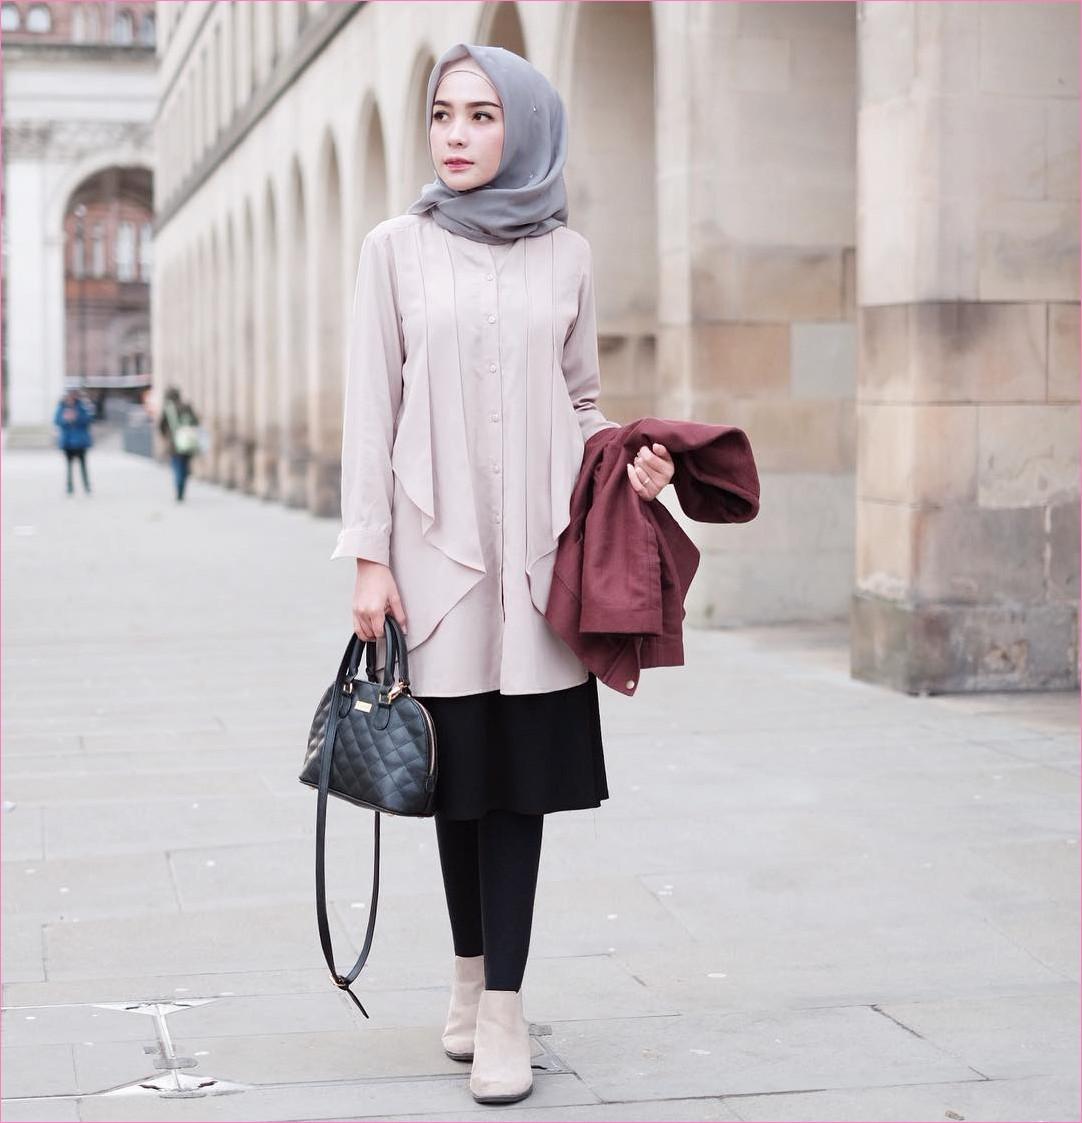 Outfit Baju Traveler Berhijab untuk Keluar Negri Ala Selebgram 2018 flats boots top blouse baby pink cardigan jacket merah bata slingbags rok legging hitam hijab square ruby abu muda ciput rajut krem ootd outfit trendy coat